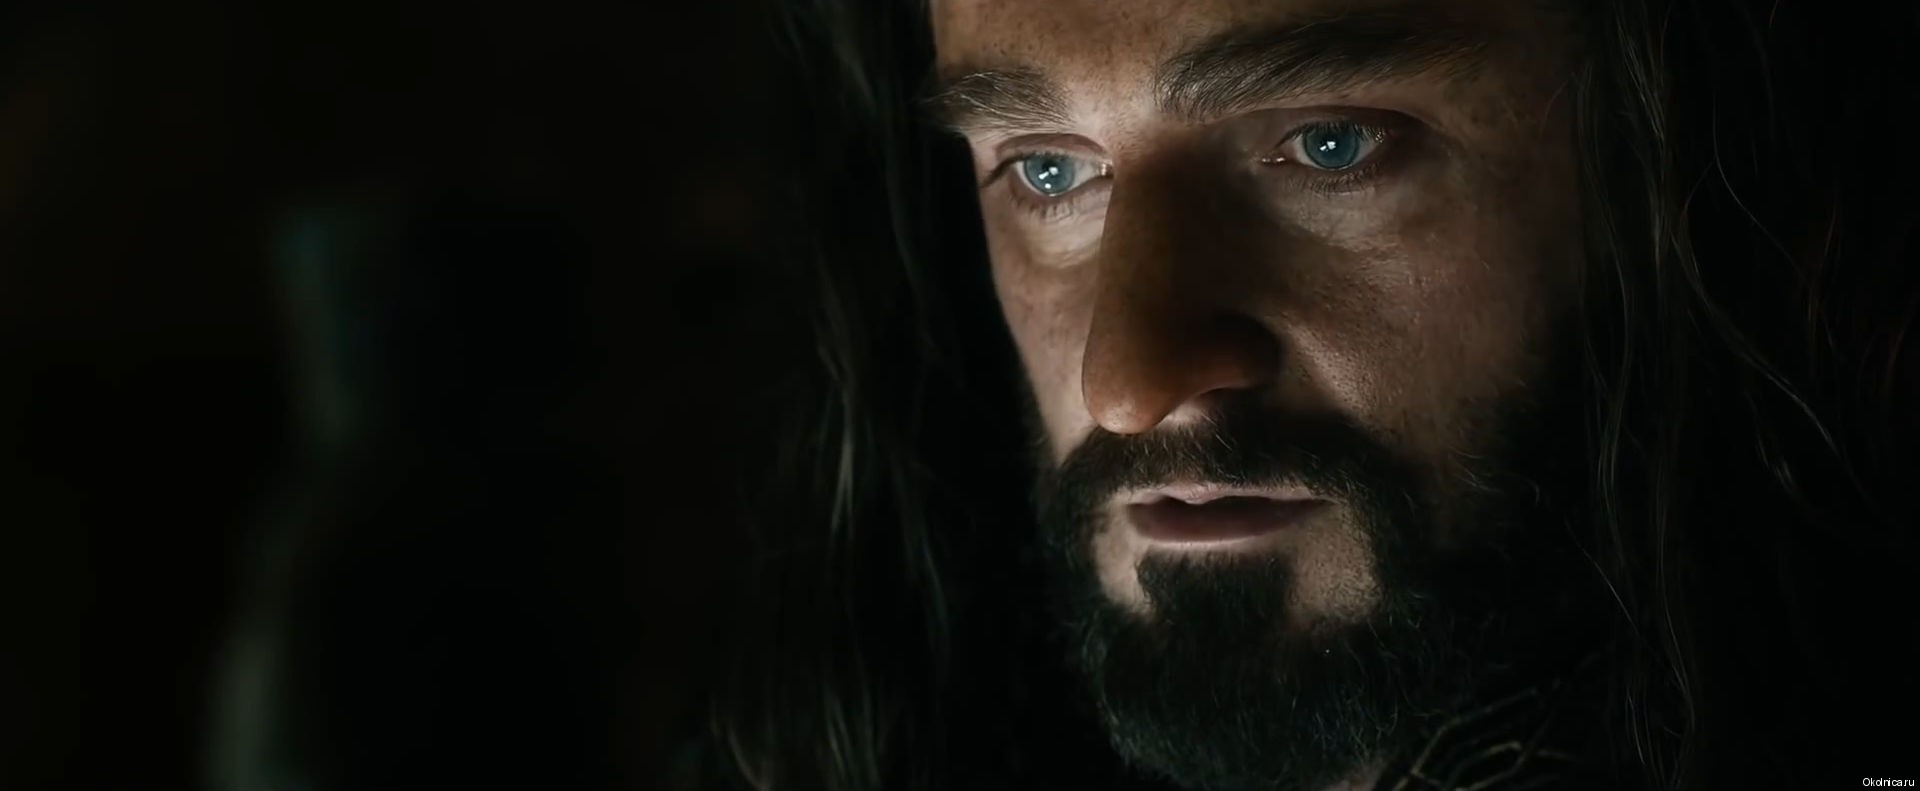 Kino_Hobbit_Bitva_pyati_voinstv_02